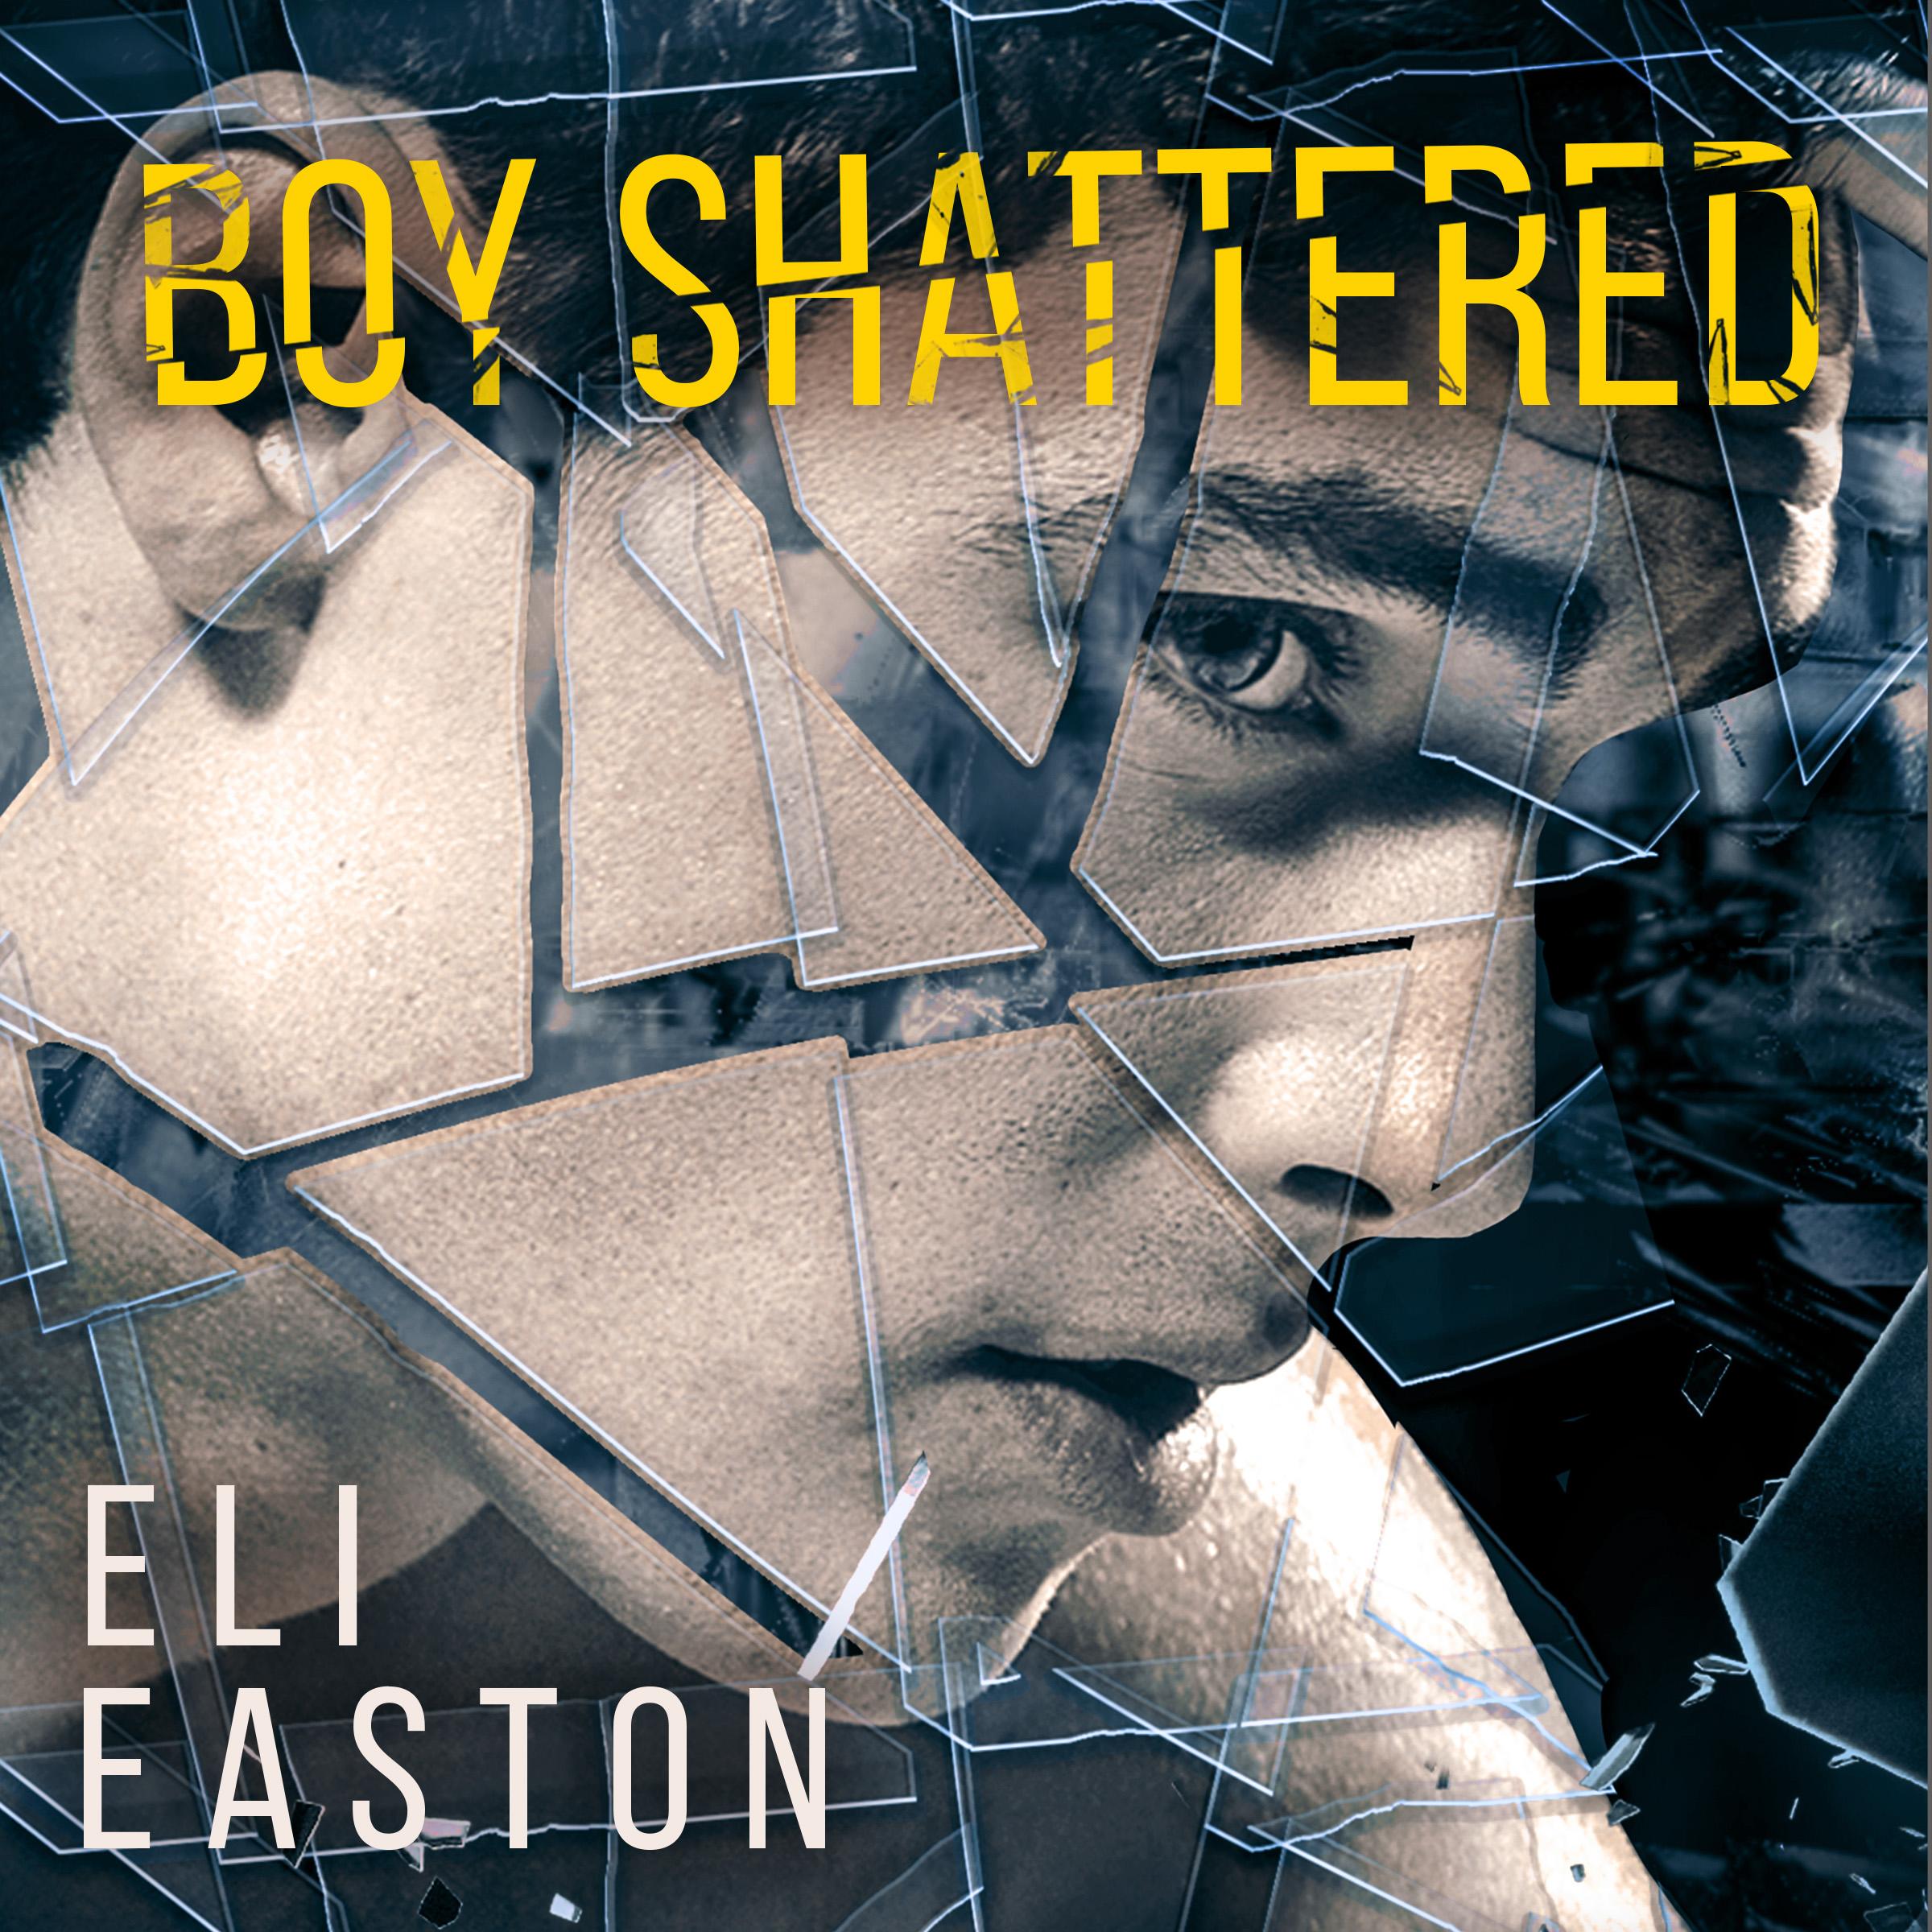 BoyShattered Audiobook Cover2